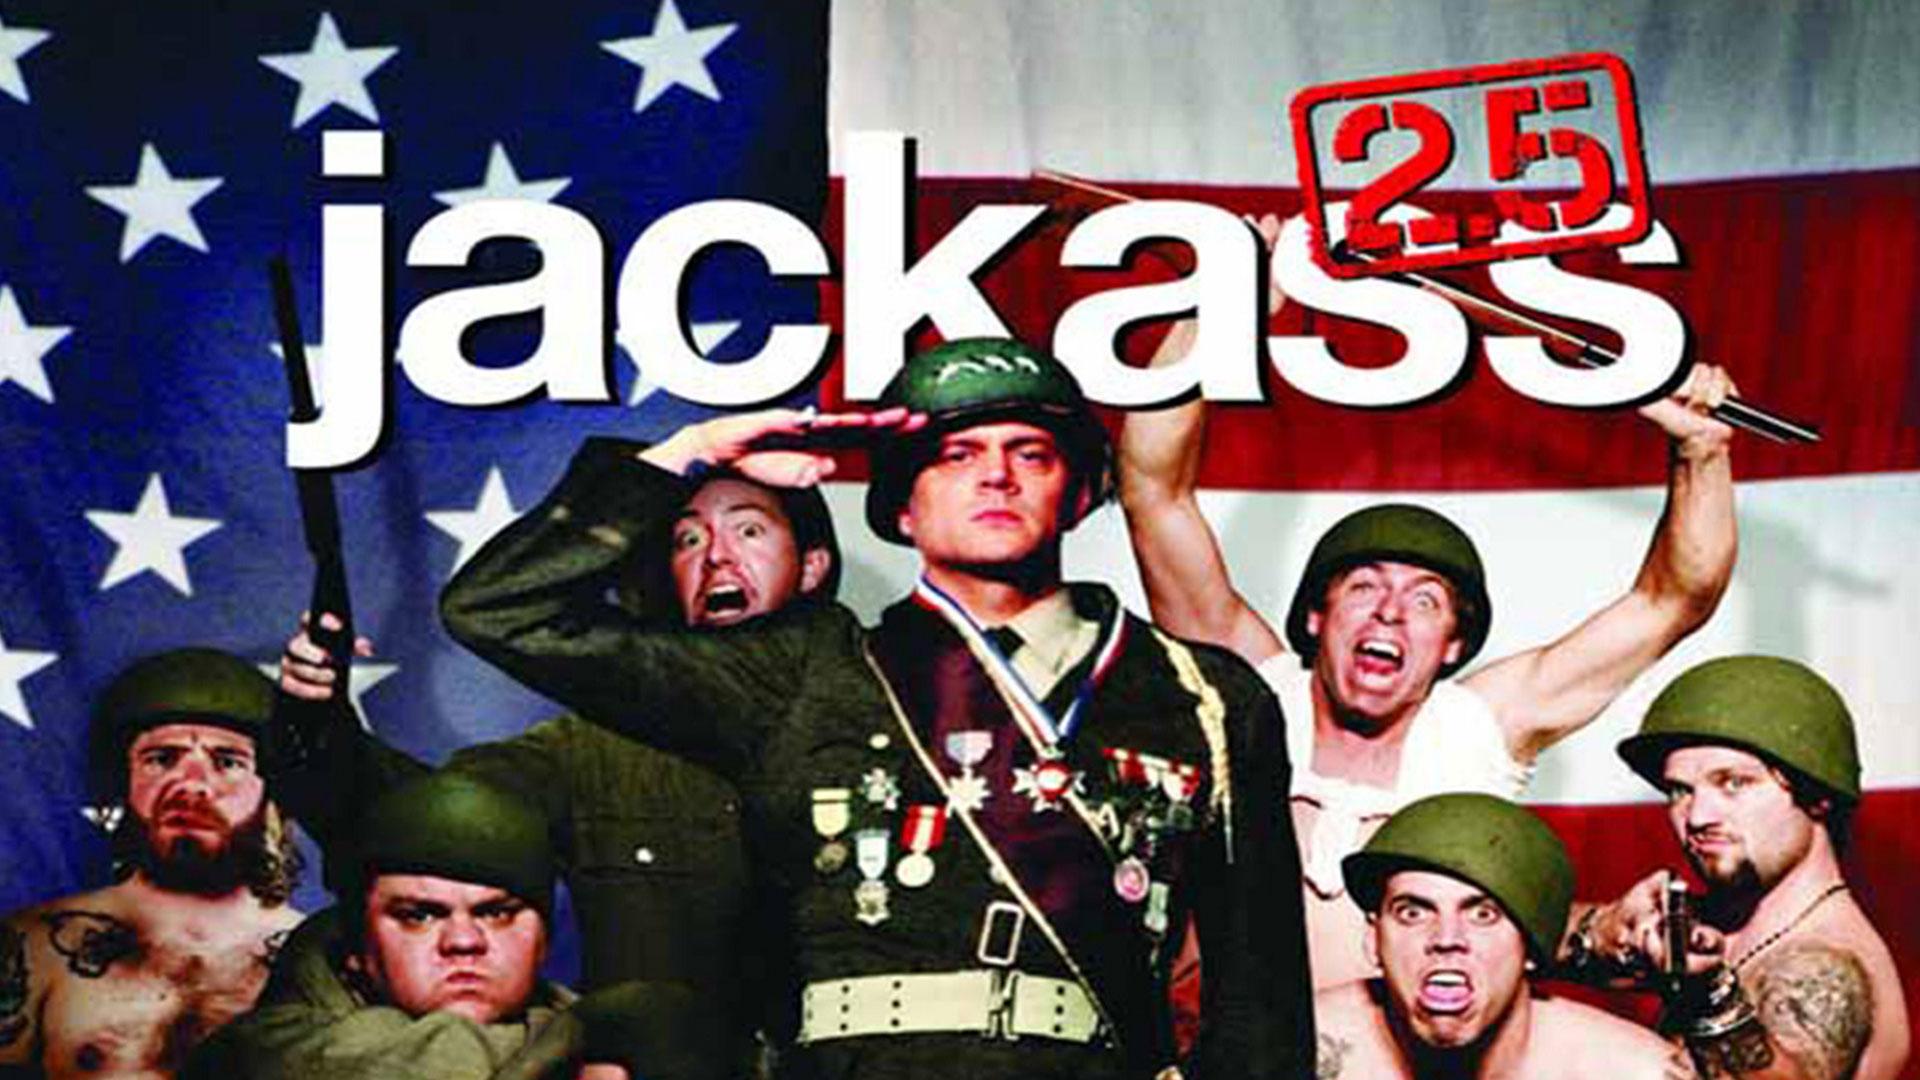 Jackass 2.5 [OmU]